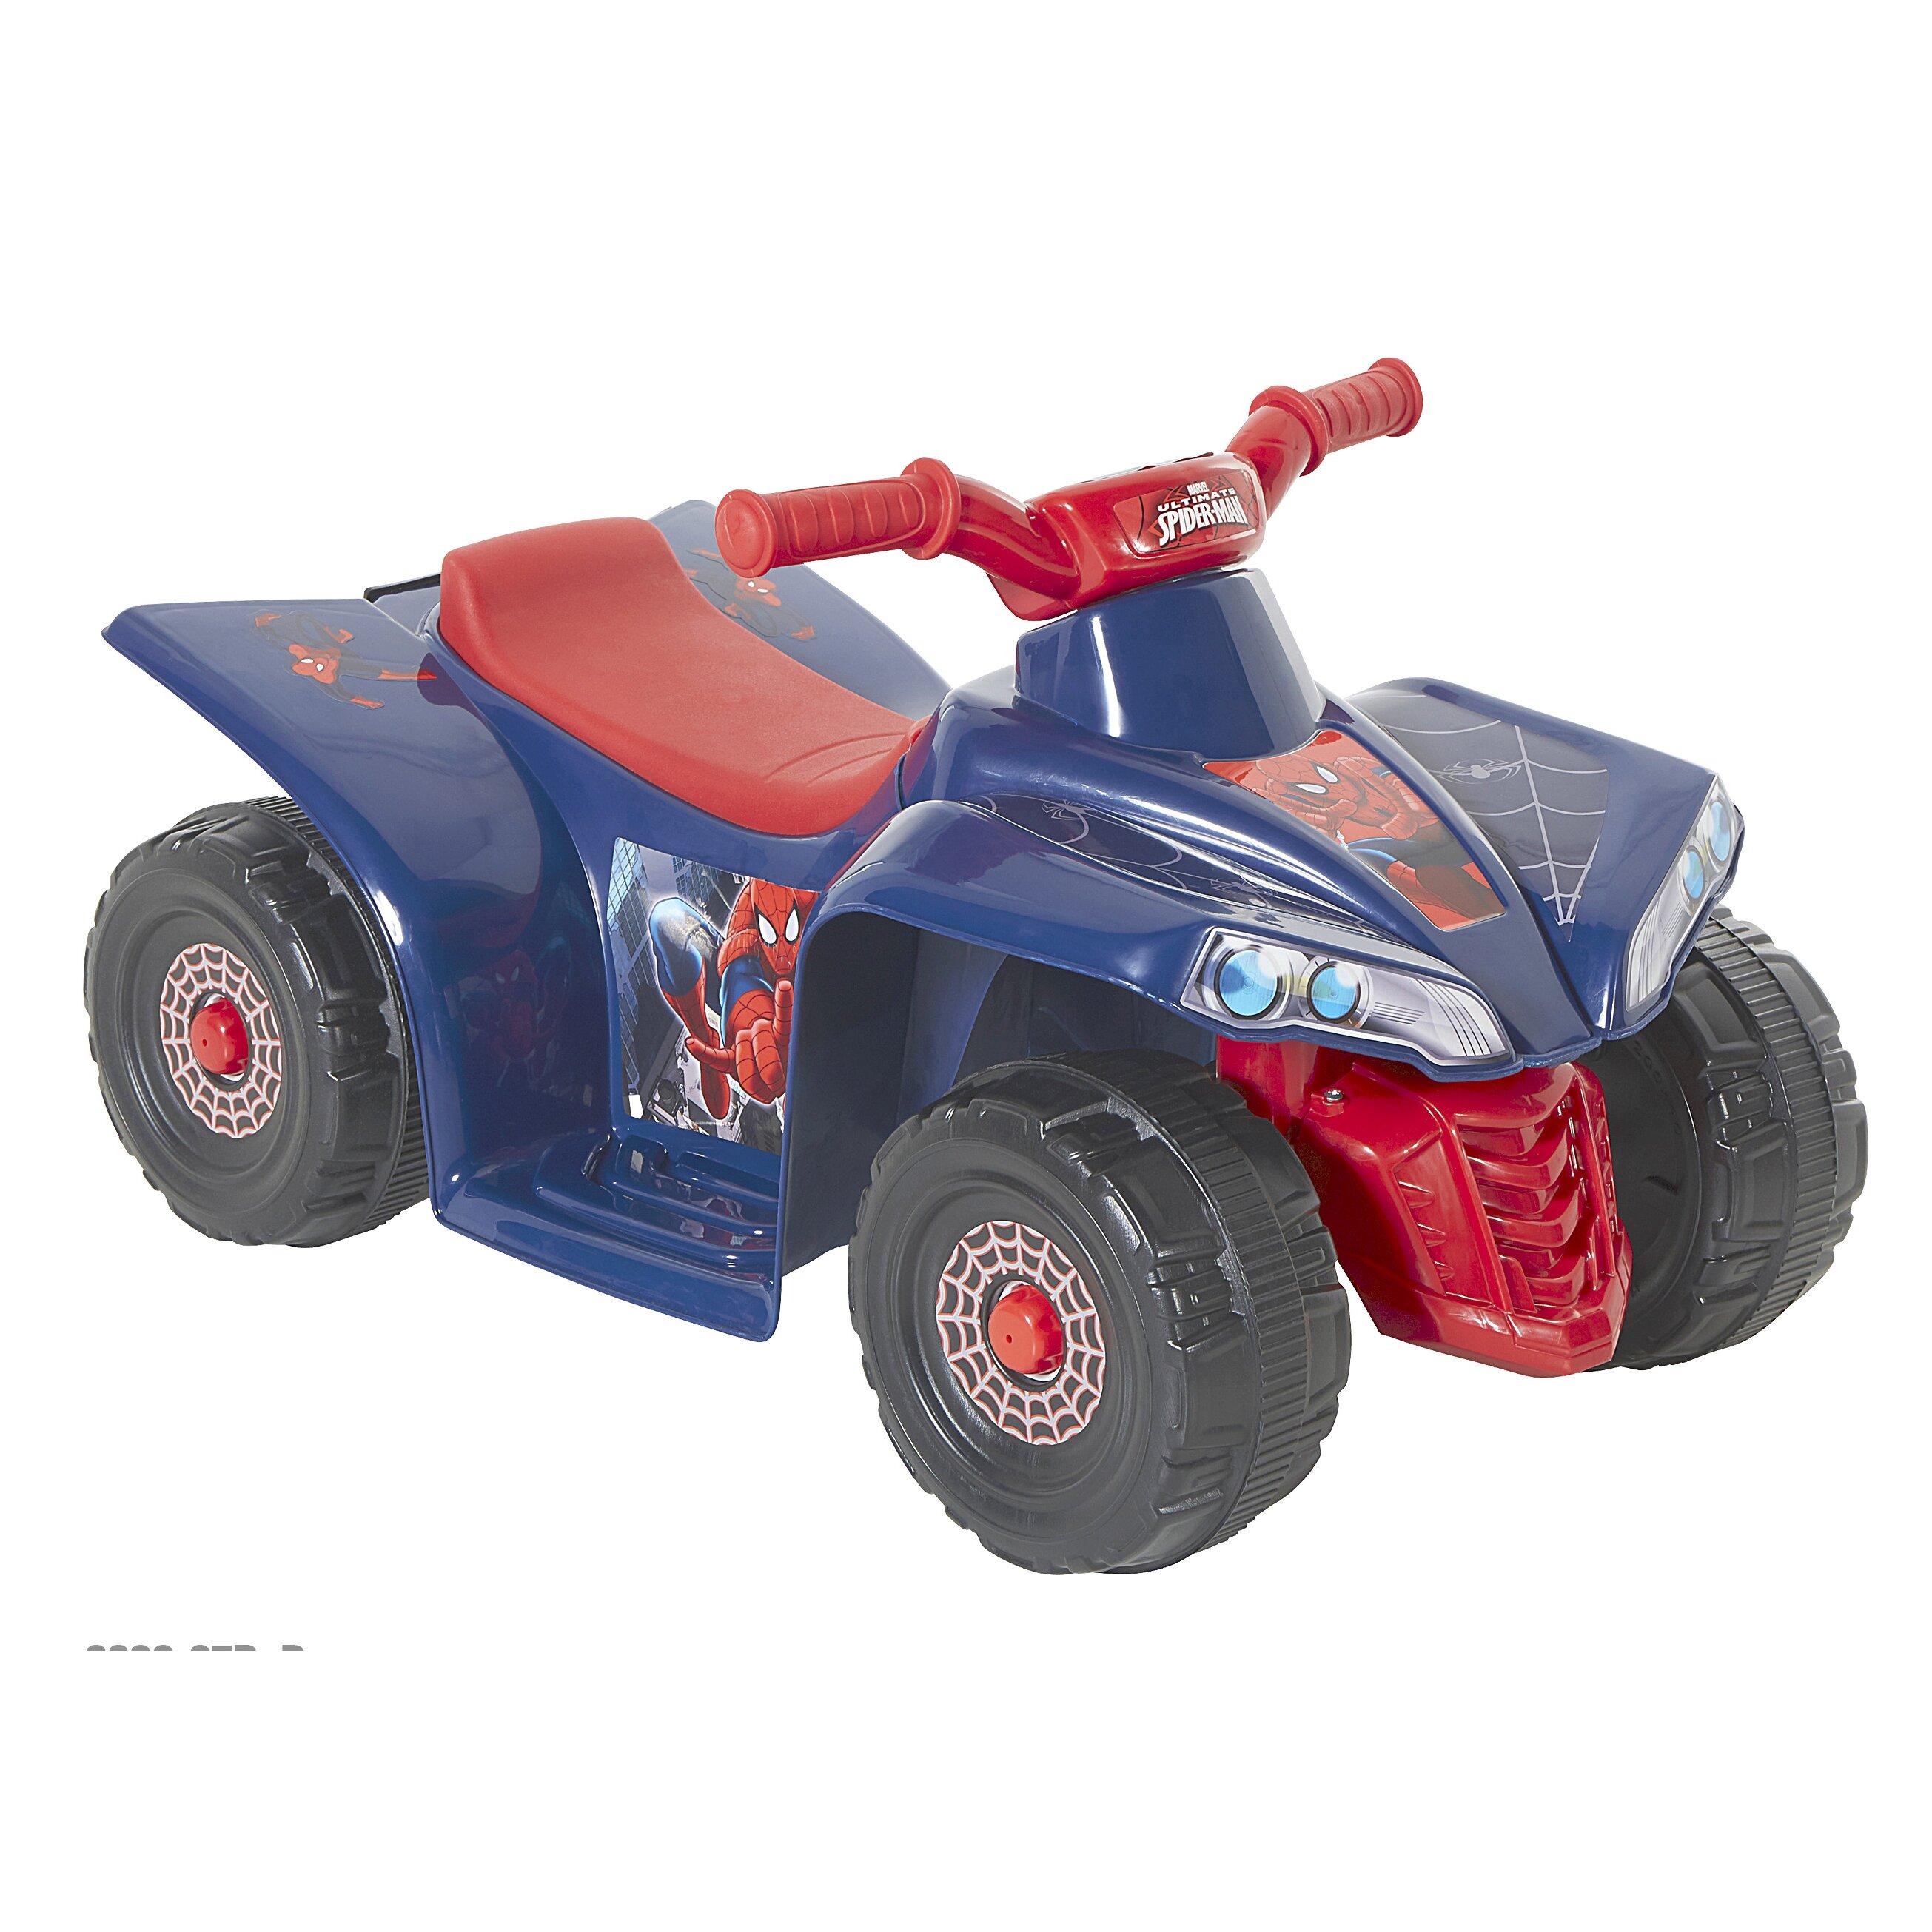 Dynacraft spider man 6v battery powered little quad reviews wayfair - Quad spiderman ...